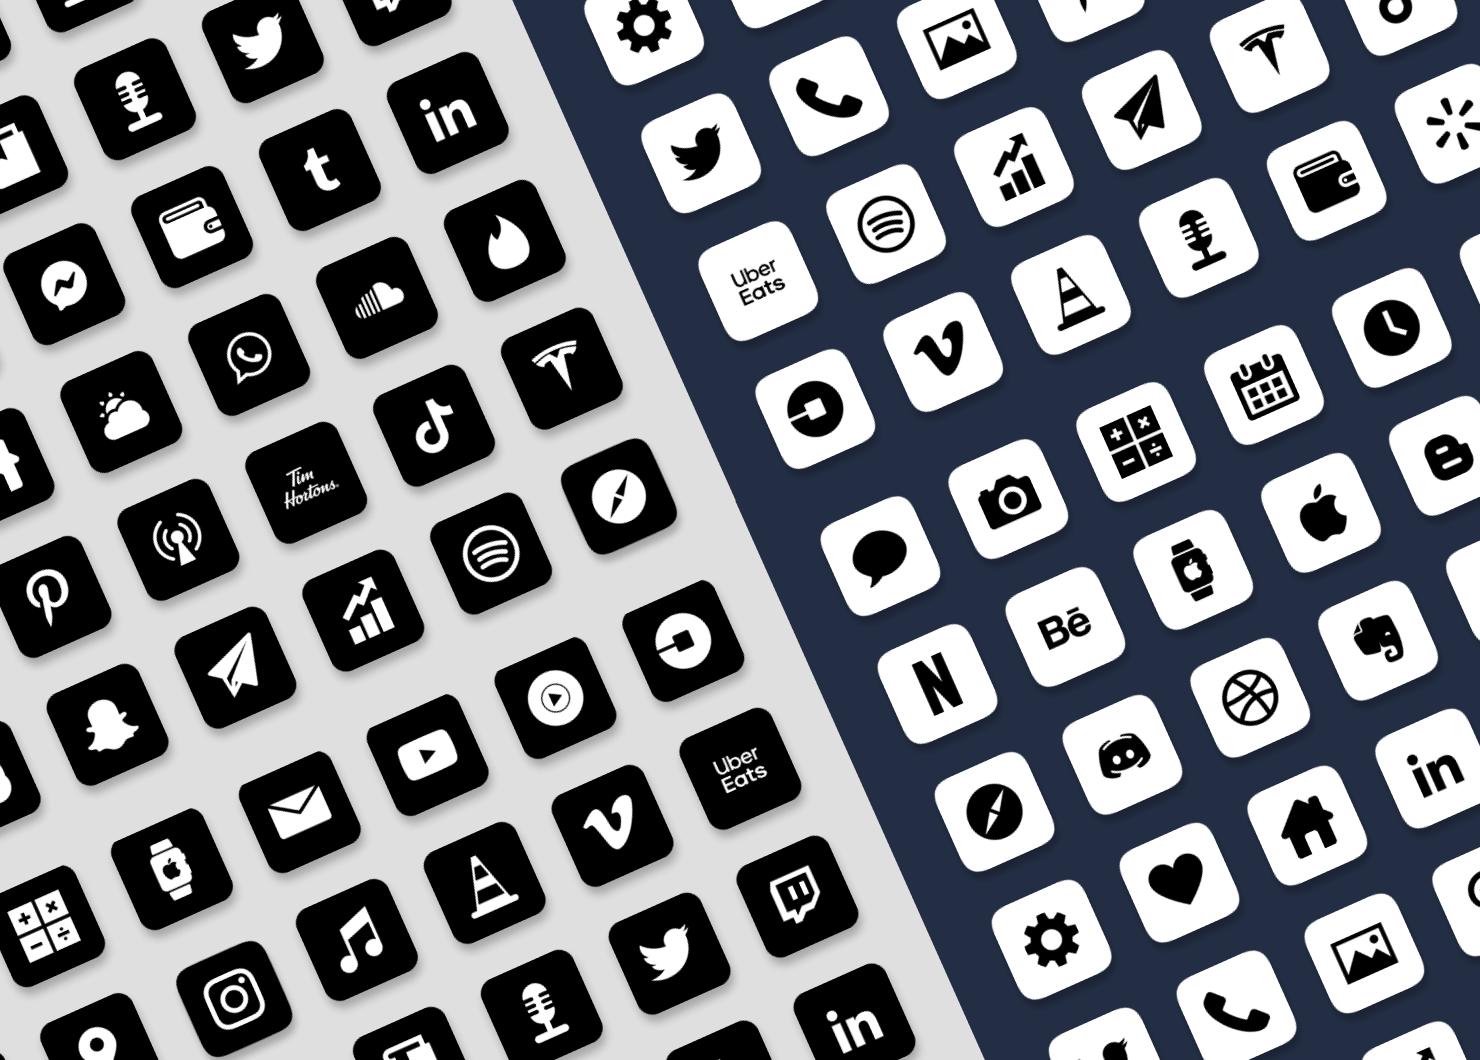 Black & white iOS app icons minimalistic